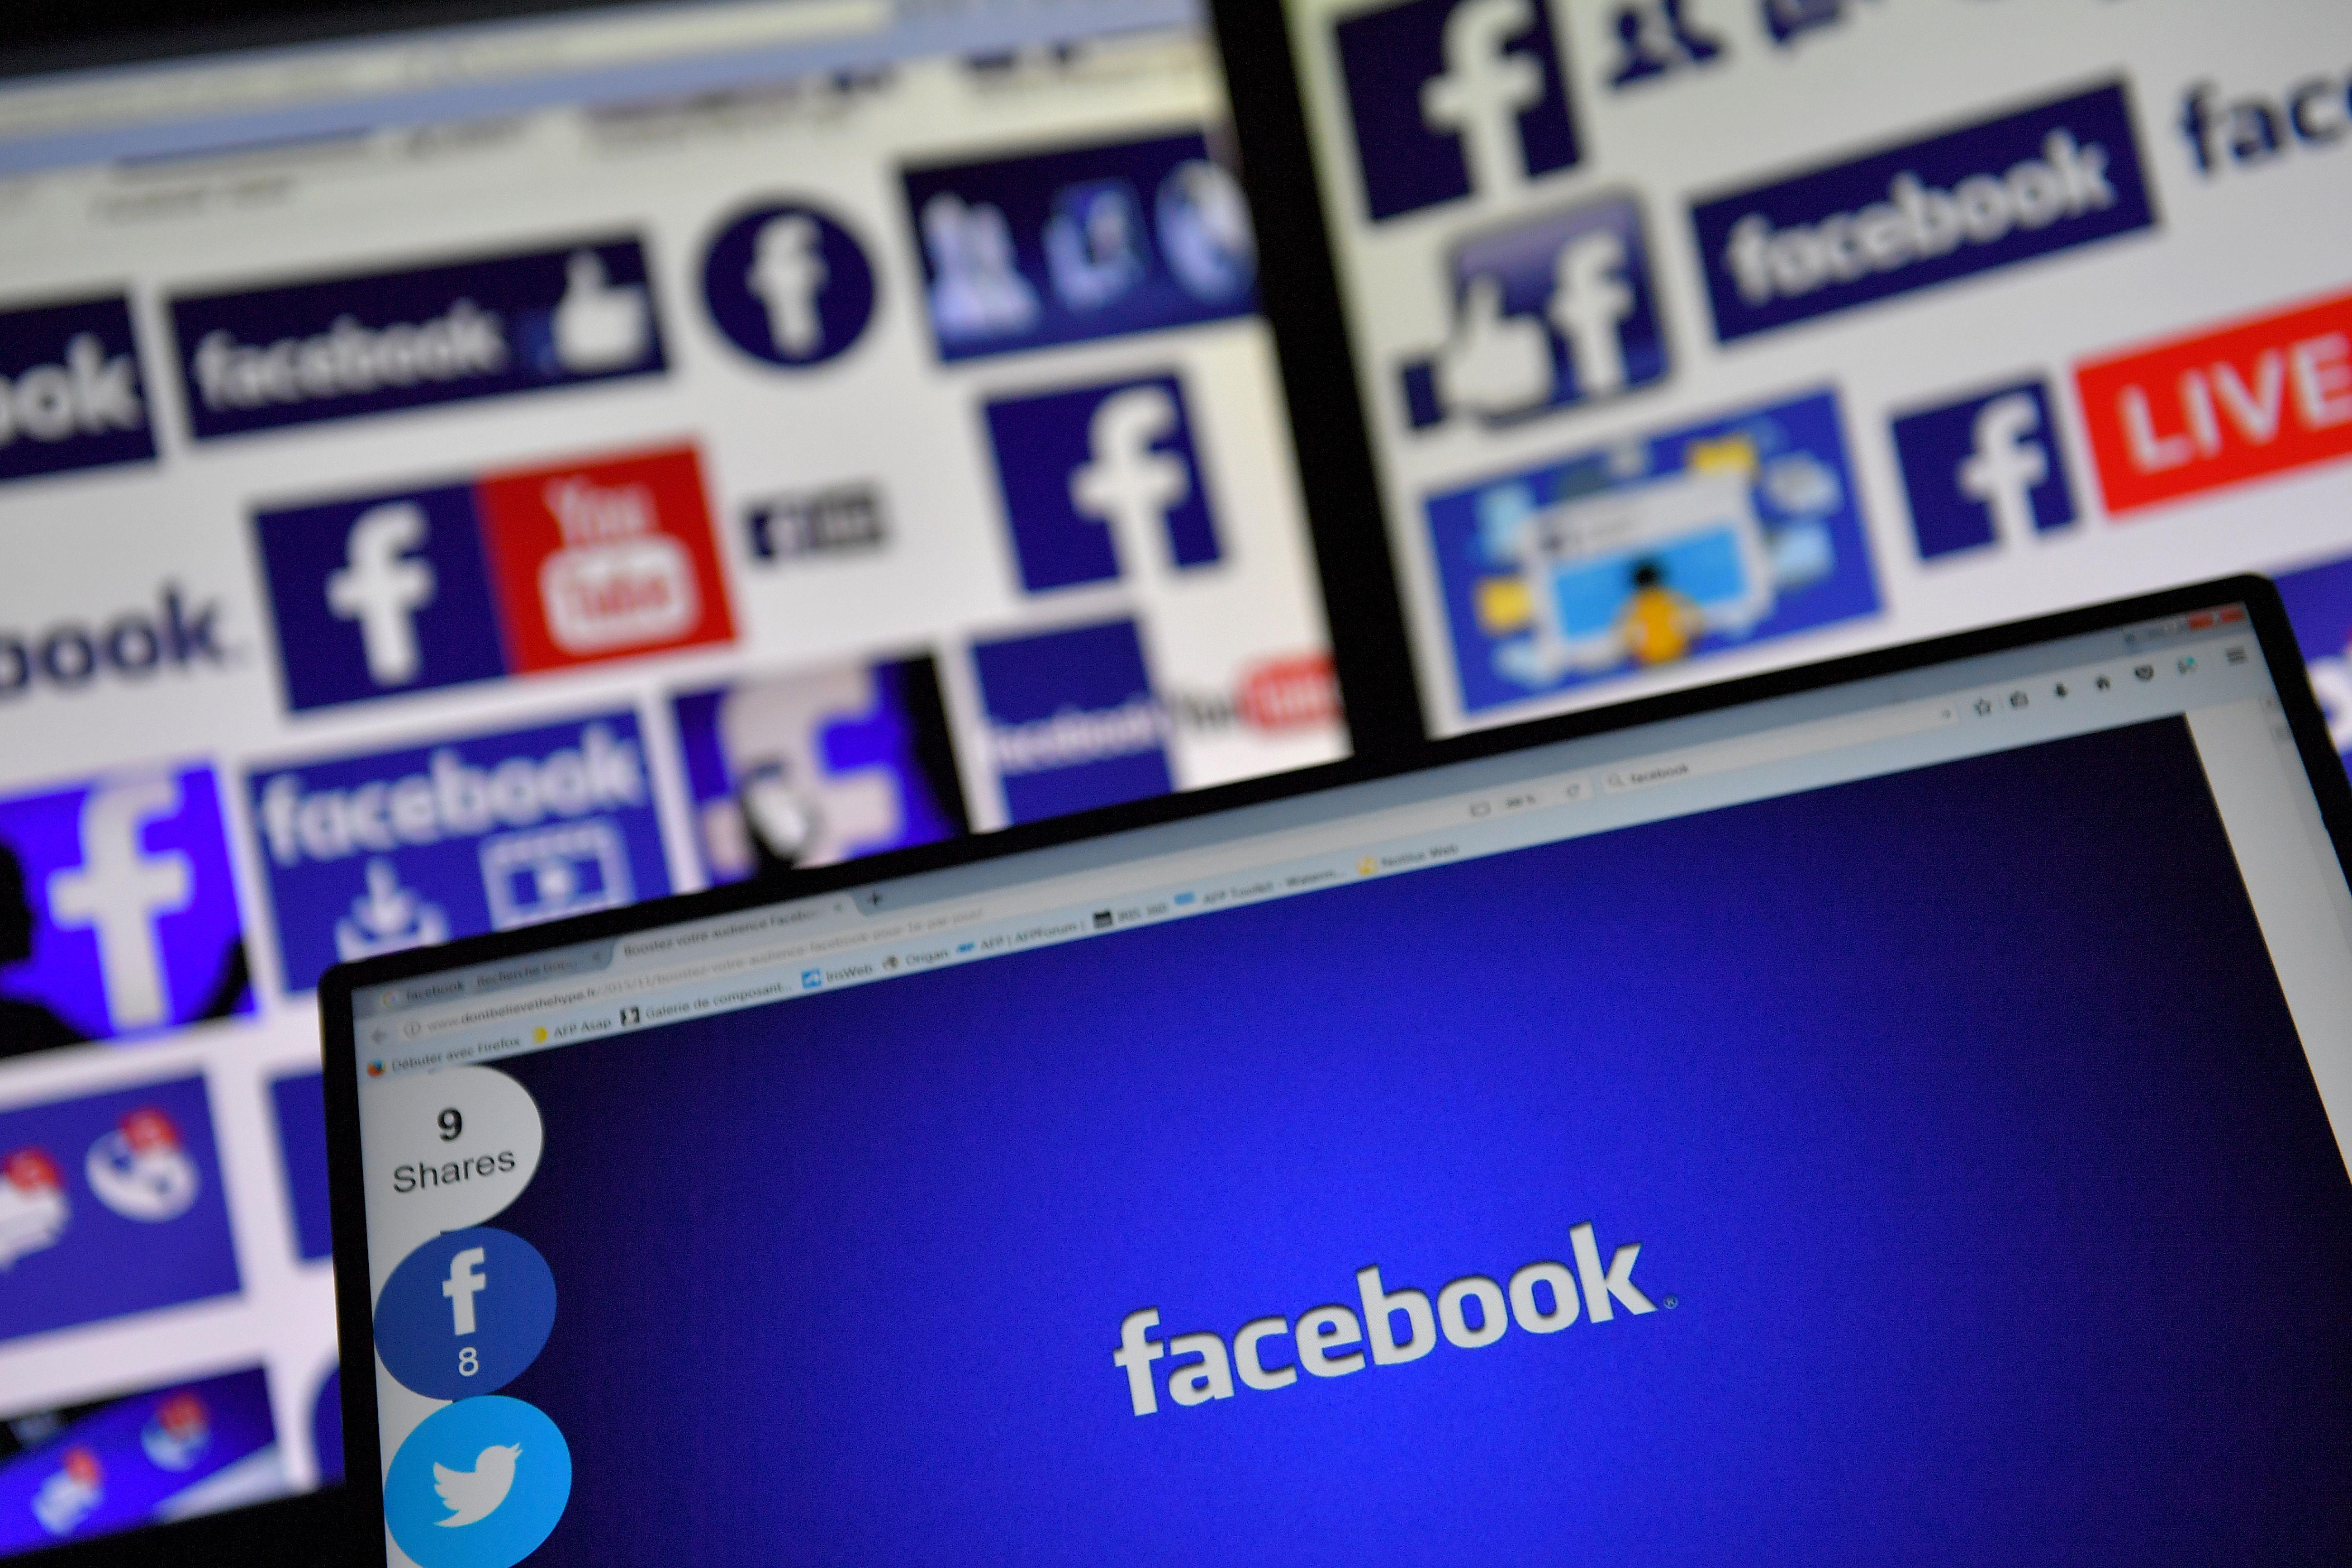 Facebook messenger logos